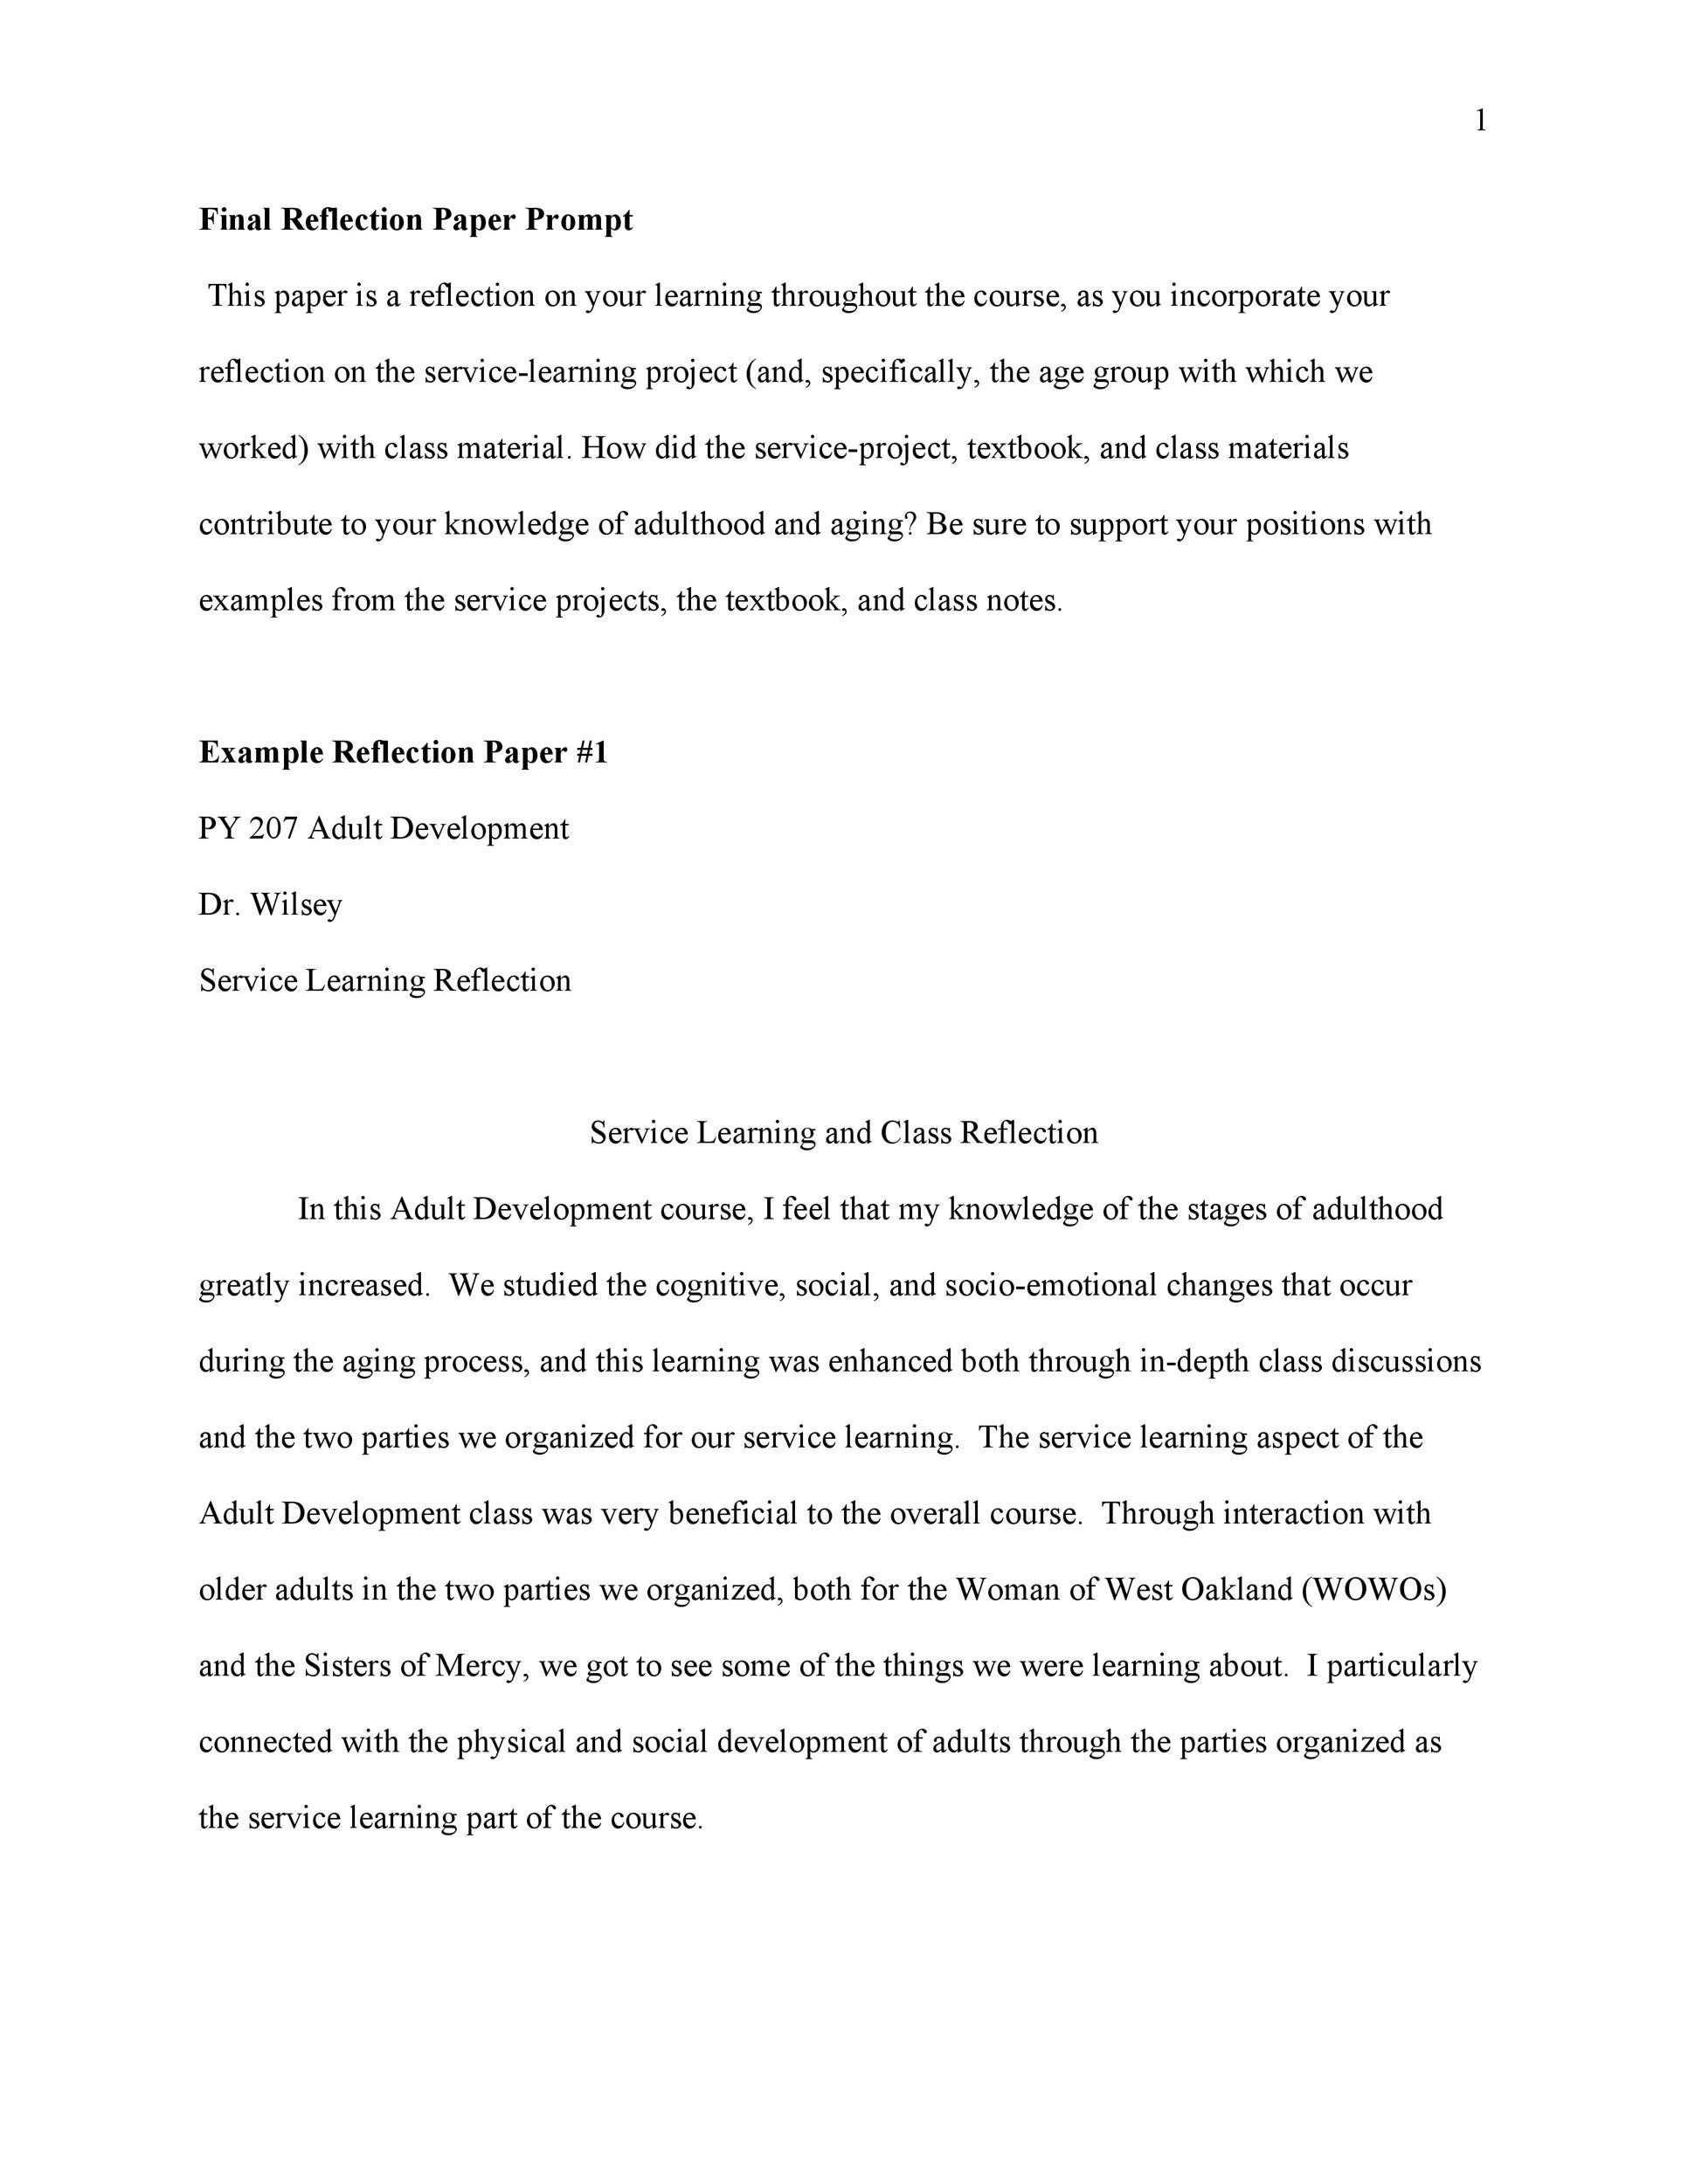 Free reflective essay example 27